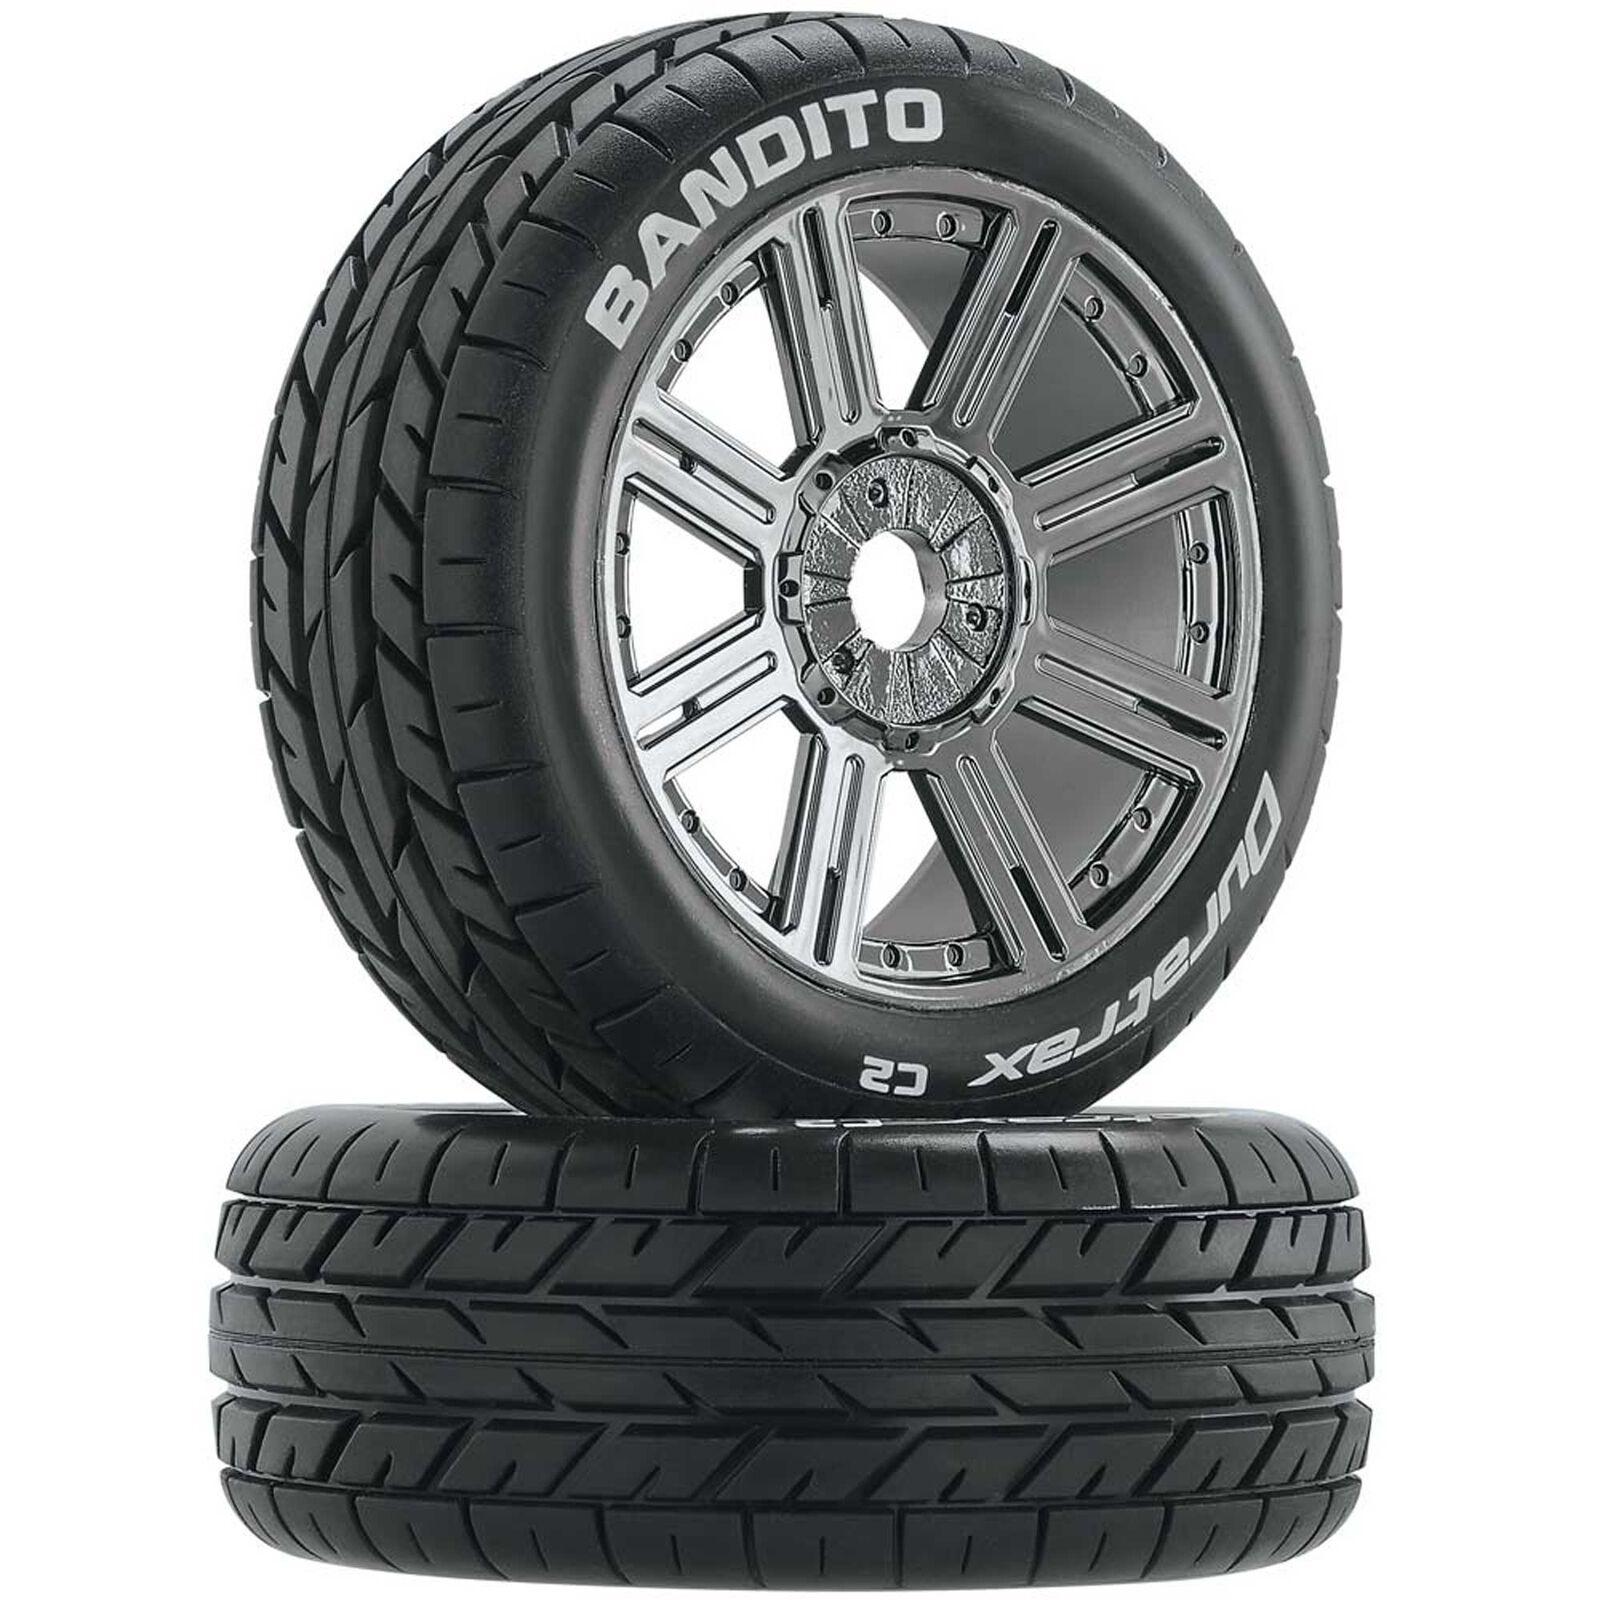 Bandito 1/8 Buggy Tire C2 Mounted Spoke Tires, Chrome (2)